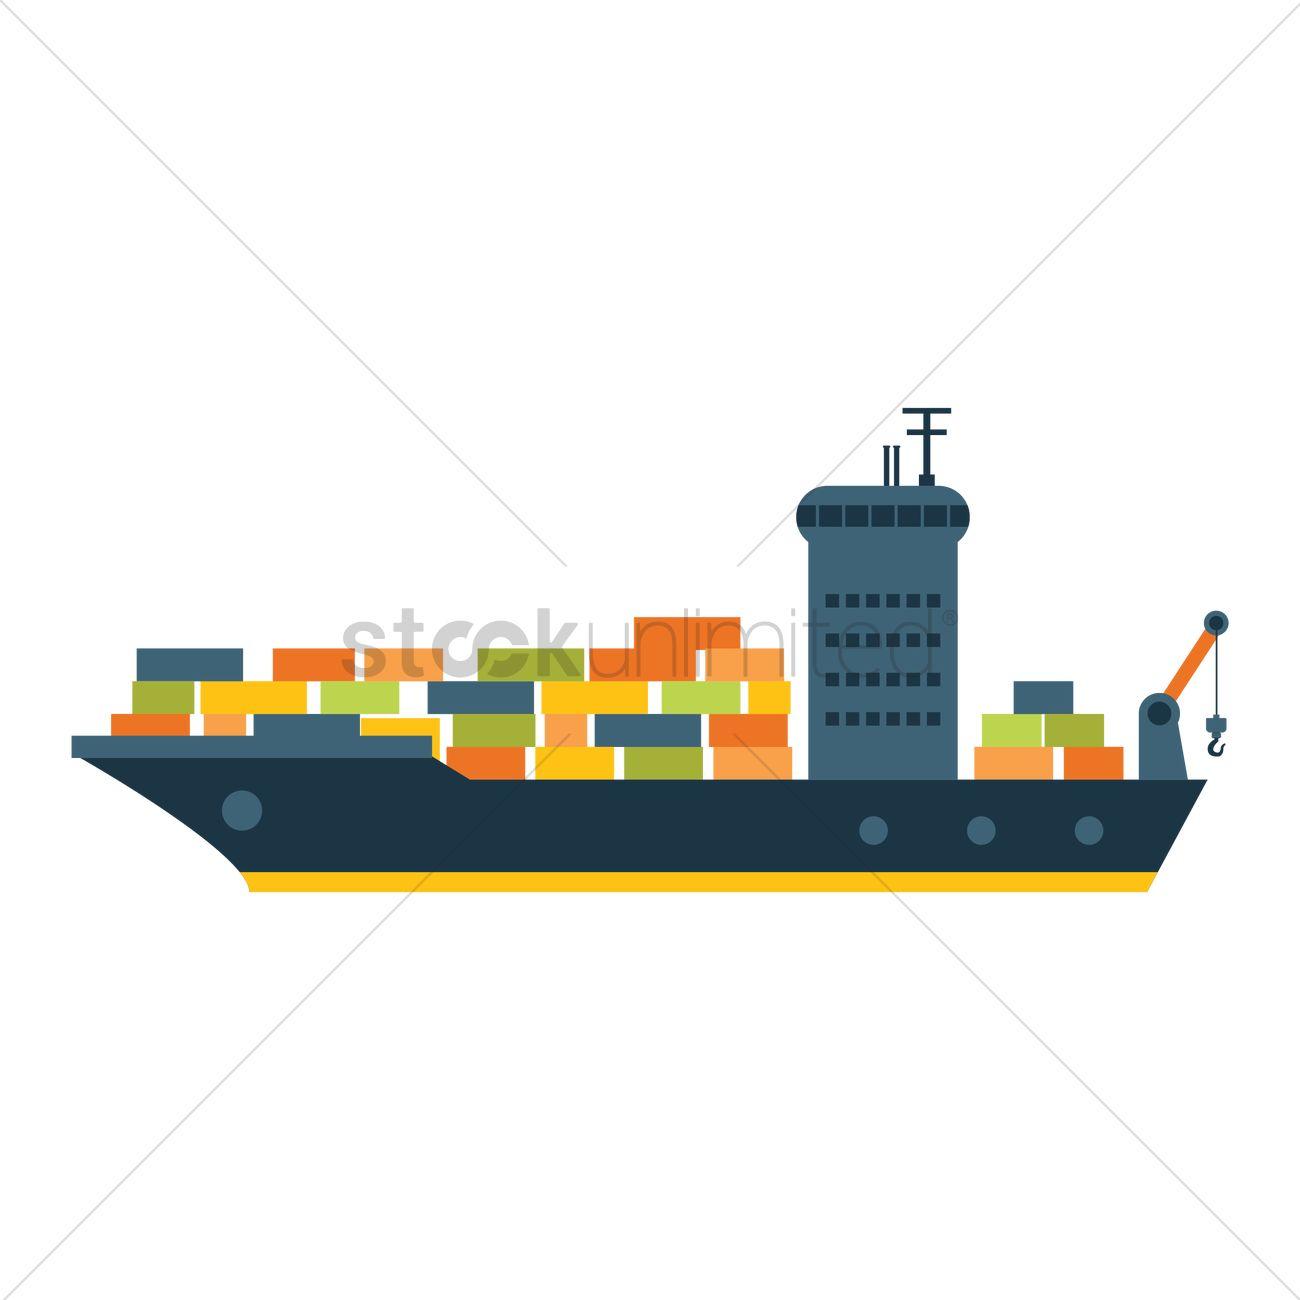 Cargo ship Vector Image - 1308050 | StockUnlimited